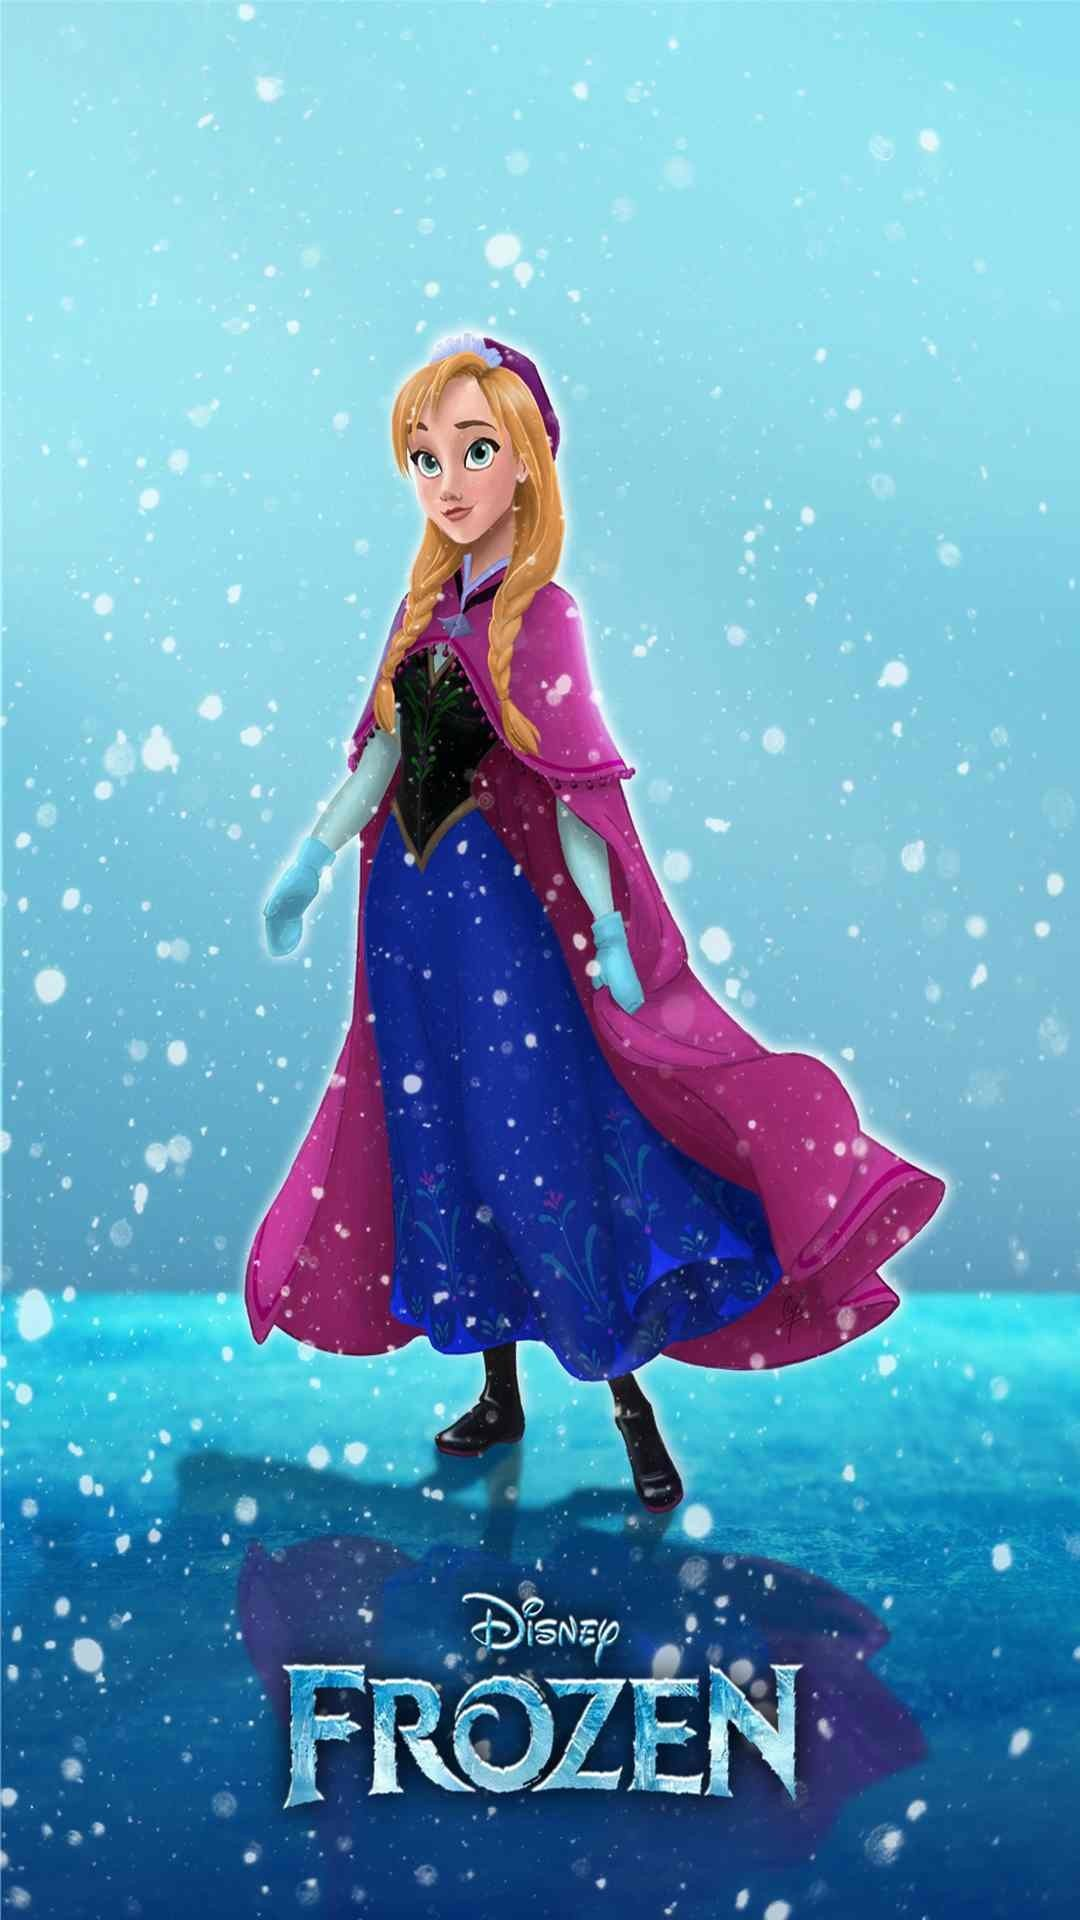 1920x1080 1920x1200 Rapunzel Of Disney Princesses Images Wallpaper 3 HD And Background Photos